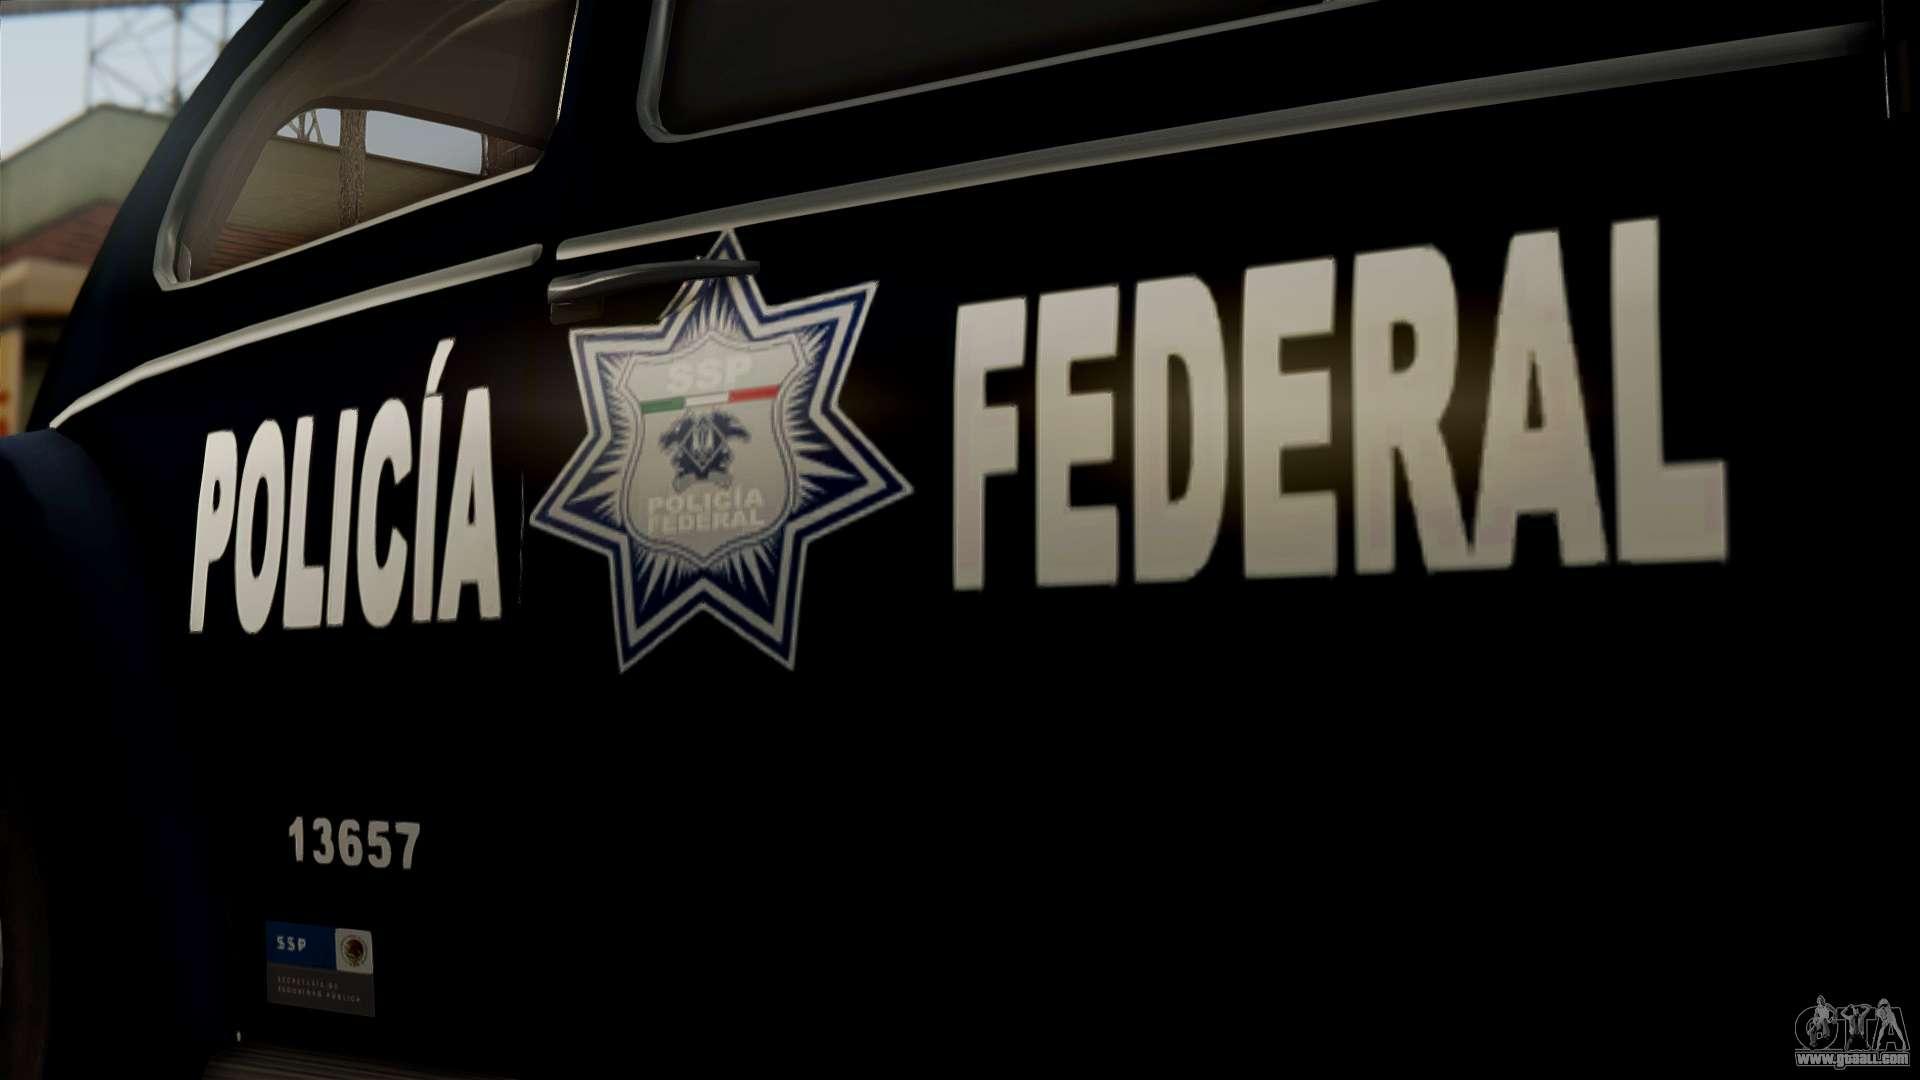 Police Car Lights Wallpaper Volkswagen Beetle 1963 Policia Federal For Gta San Andreas